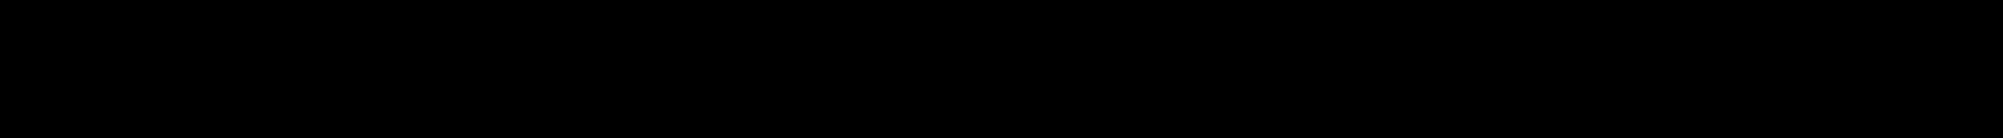 Edition Salzgeber